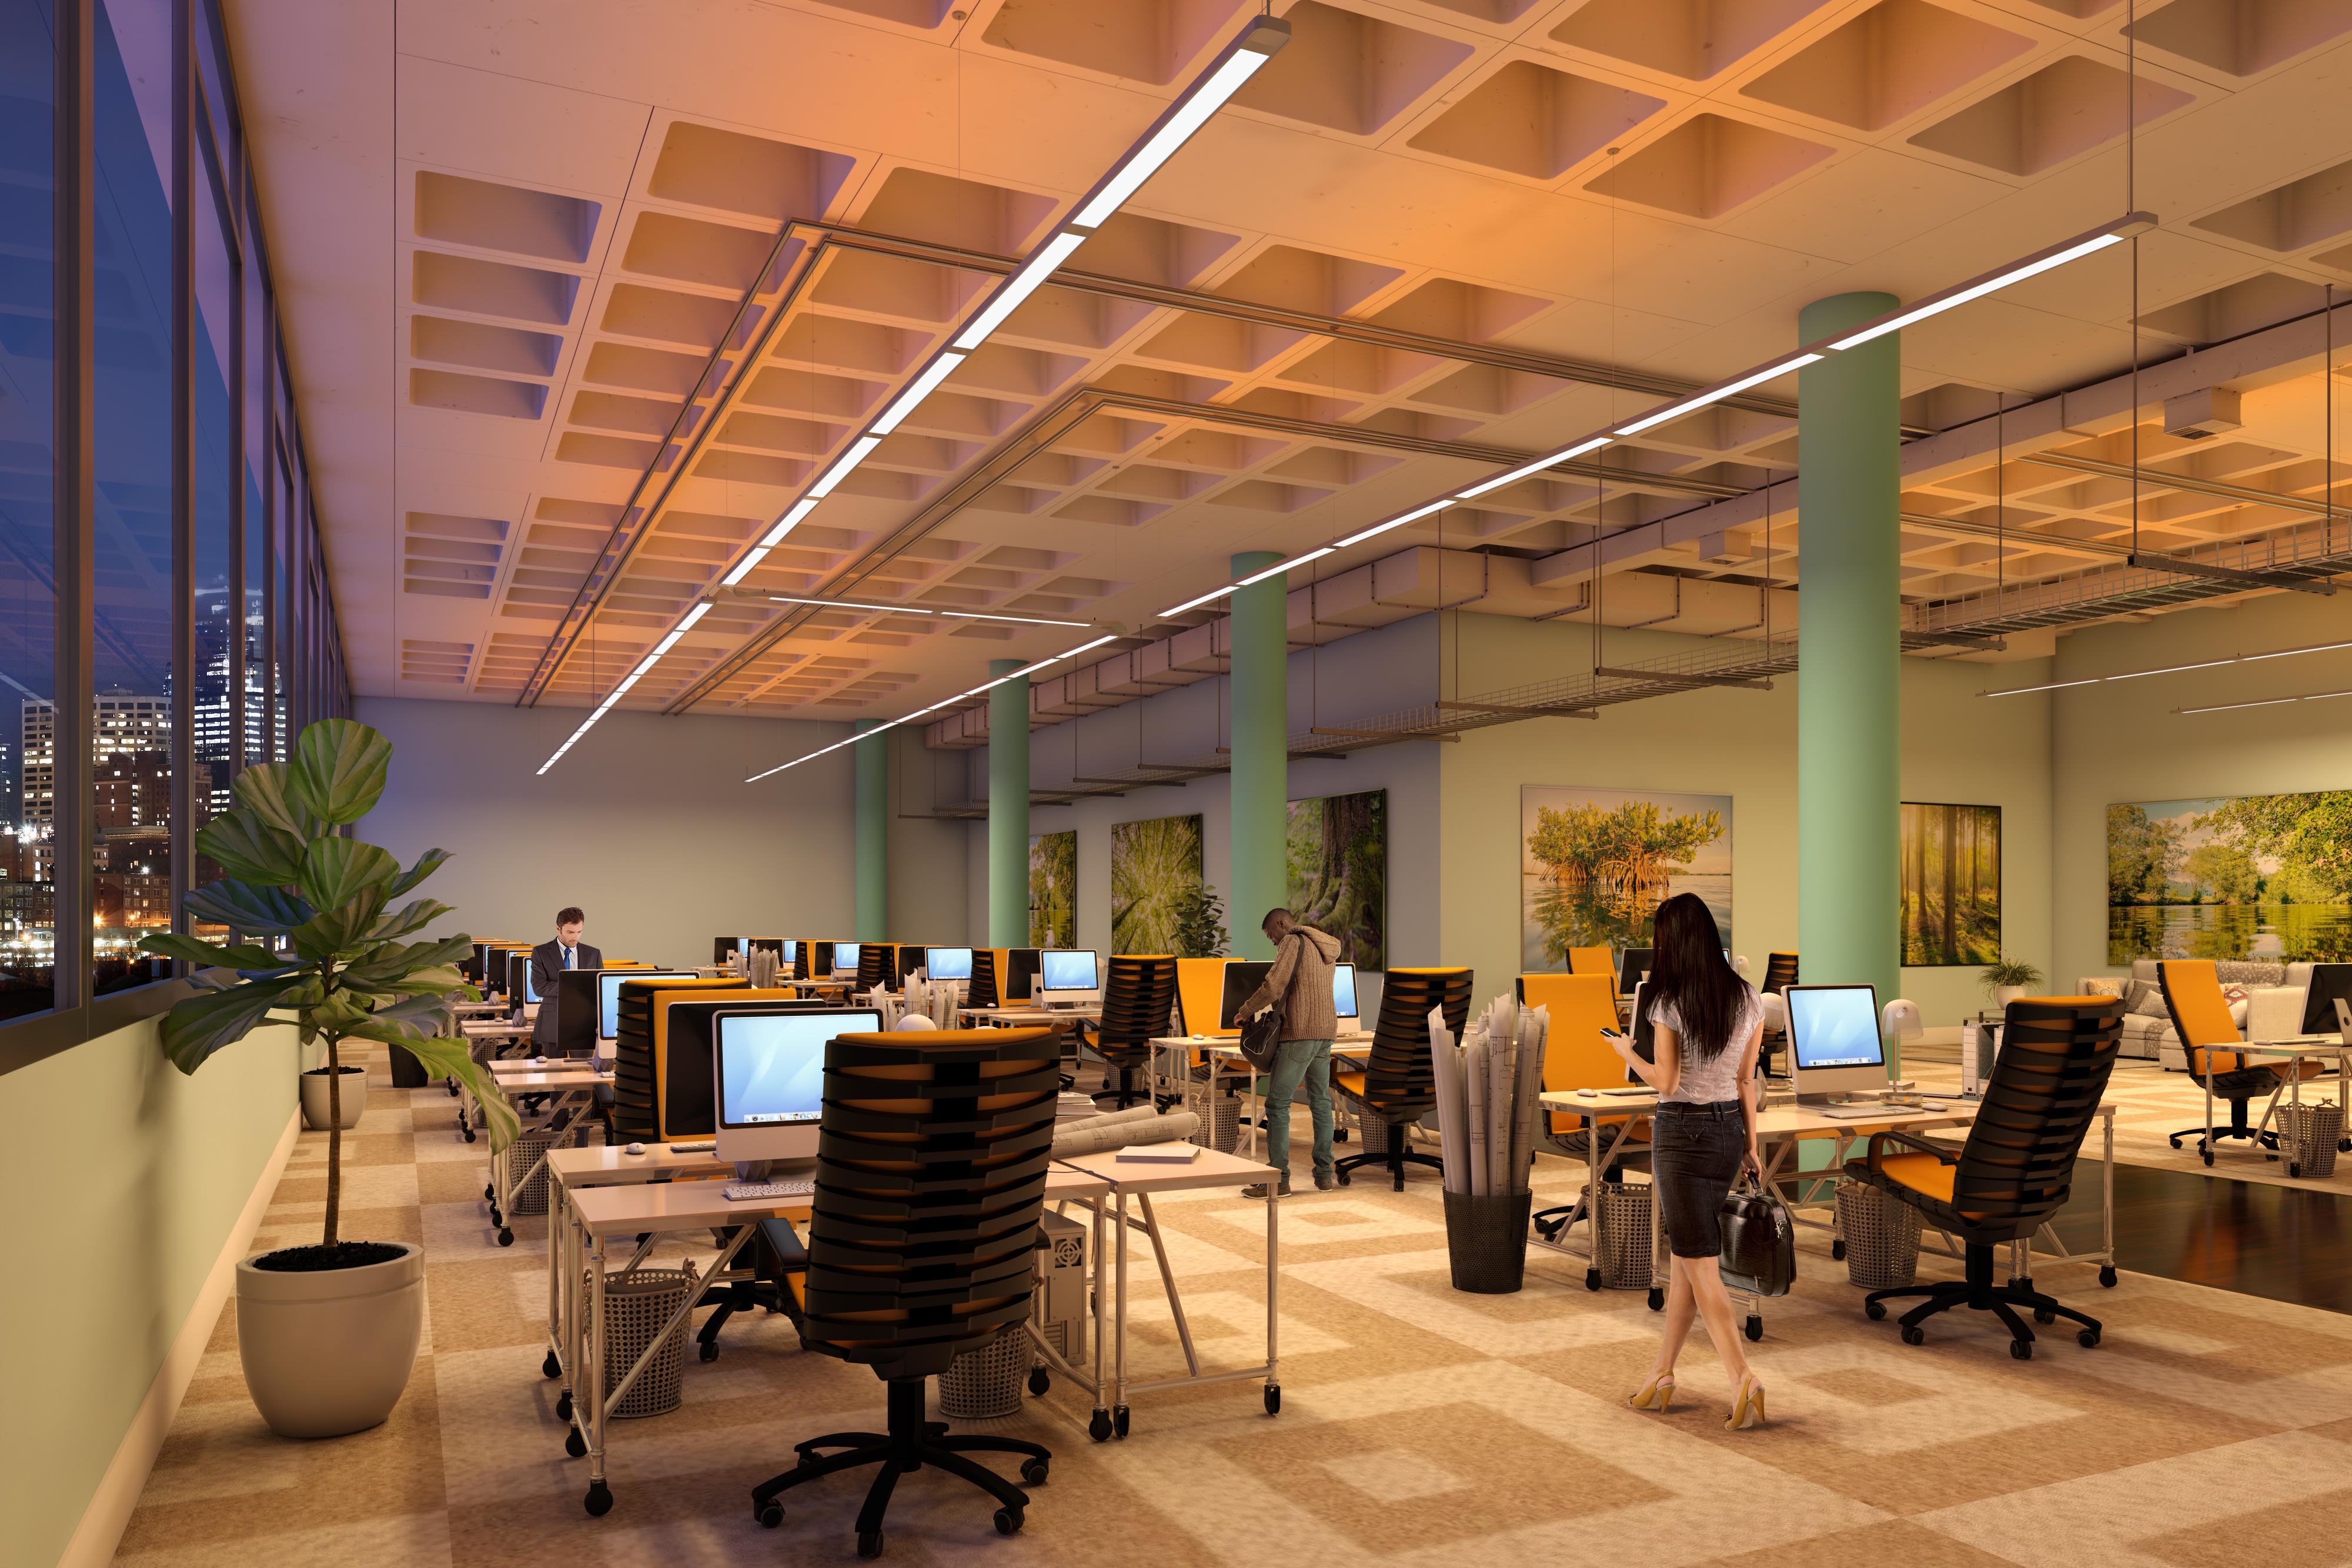 Renna_Office05Night_FI_11-22-19.jpg